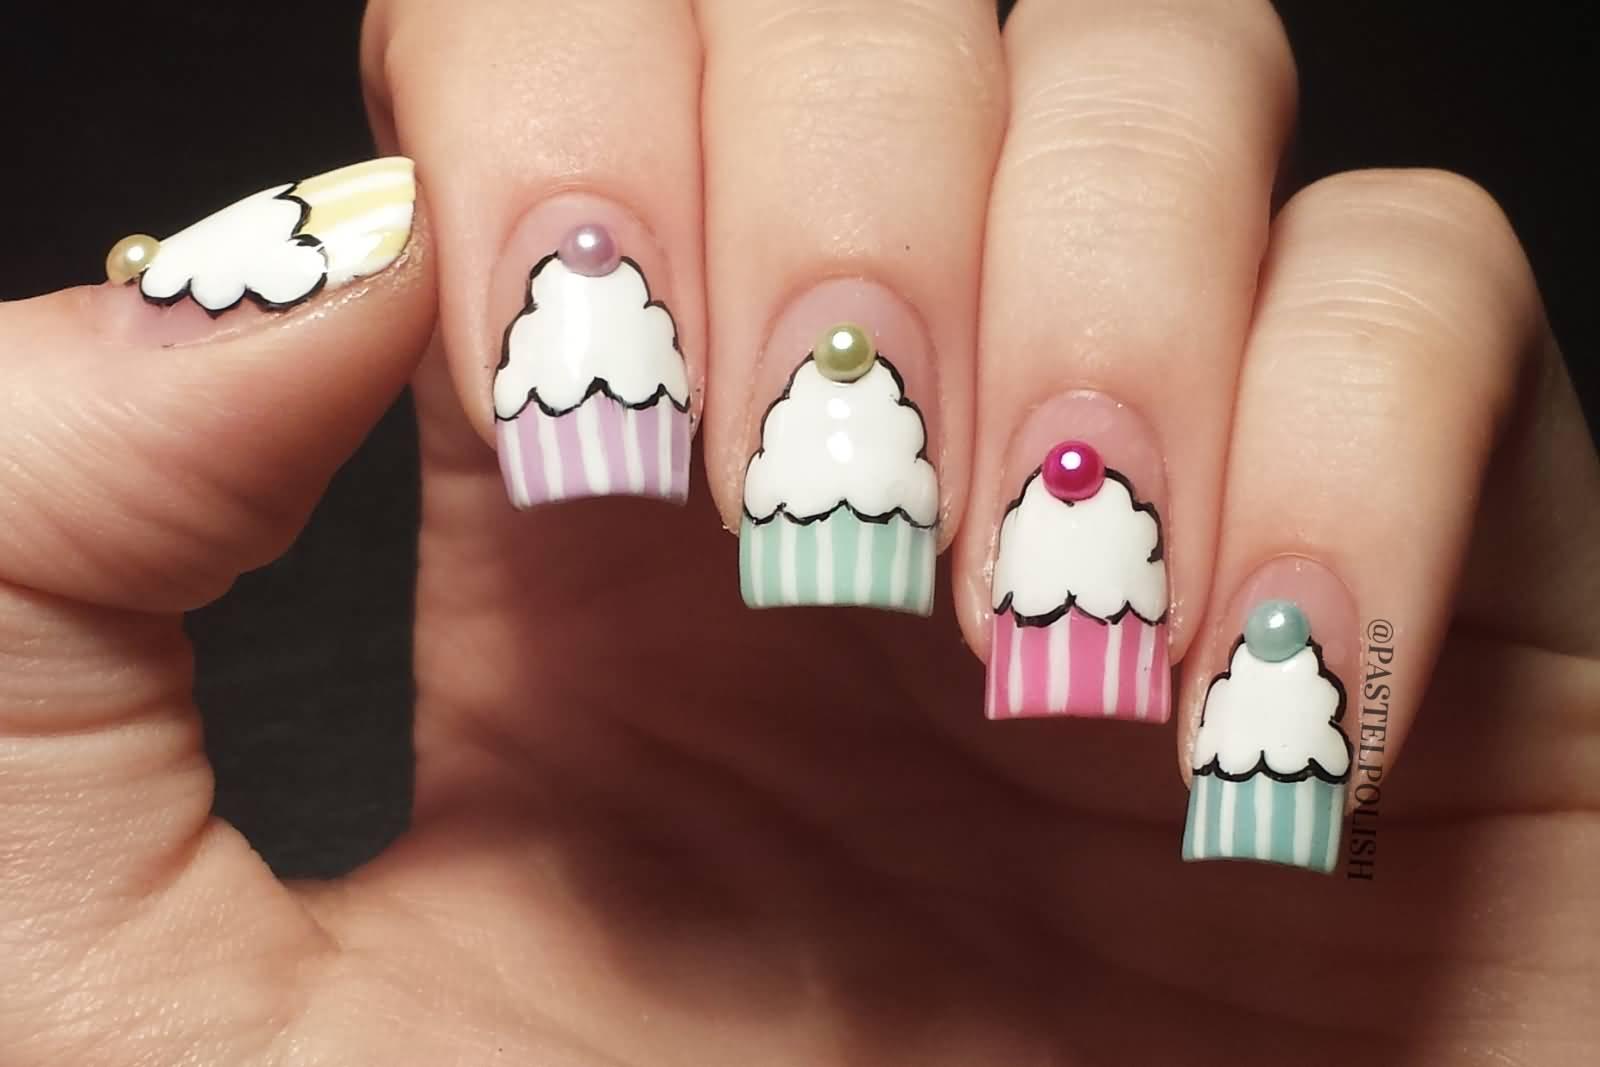 51 wonderful cupcake nail art design ideas for girls awesome cupcake nail art design prinsesfo Gallery